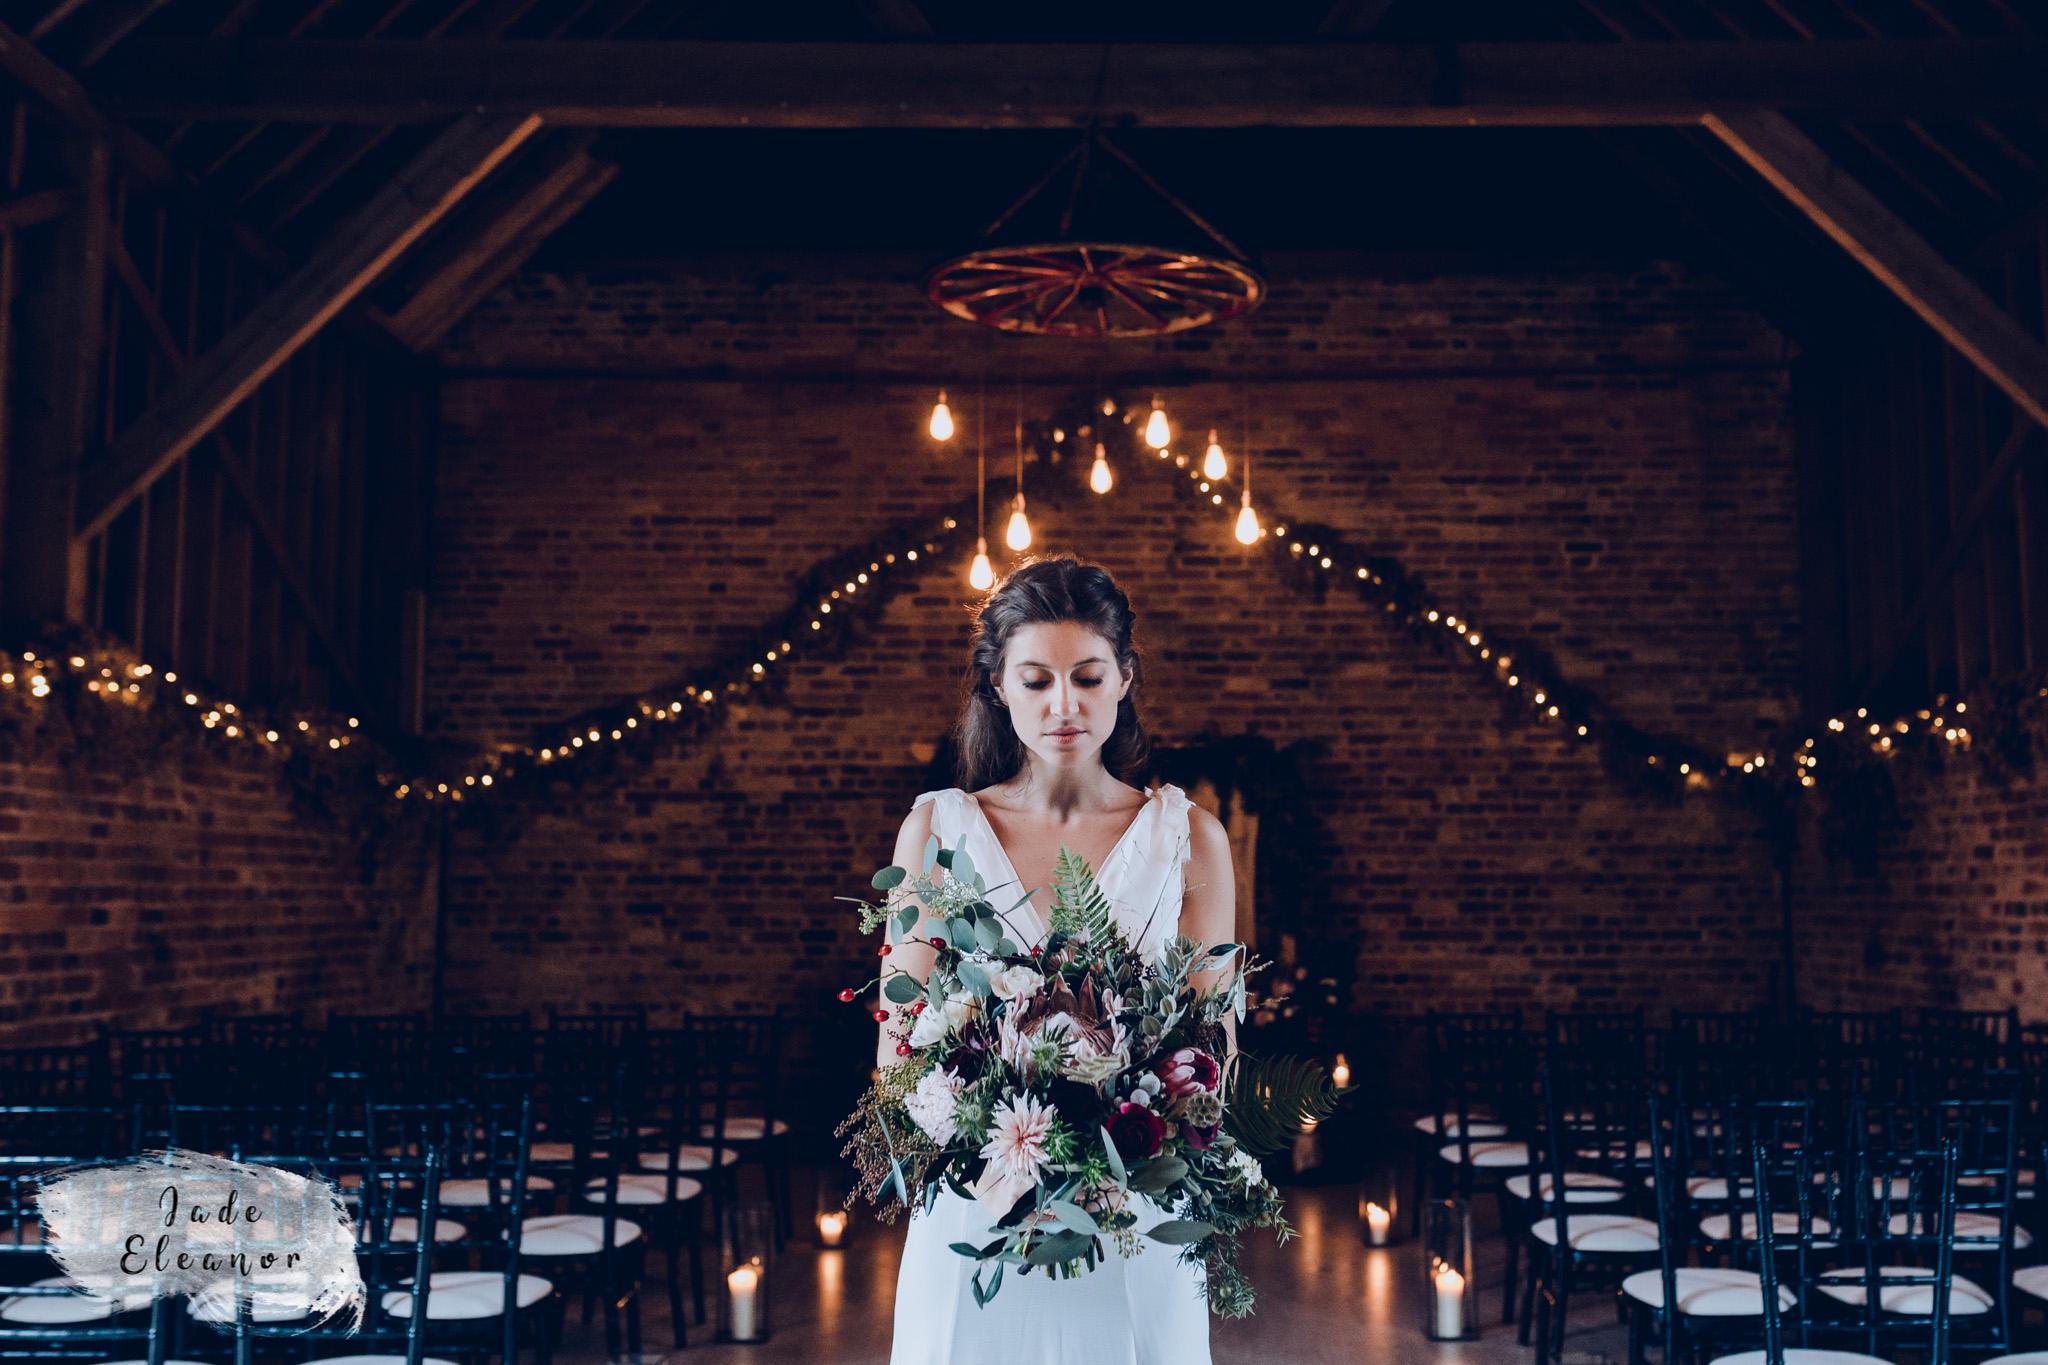 Bysshe Court Barn Wedding Jade Eleanor Photography-2.jpg